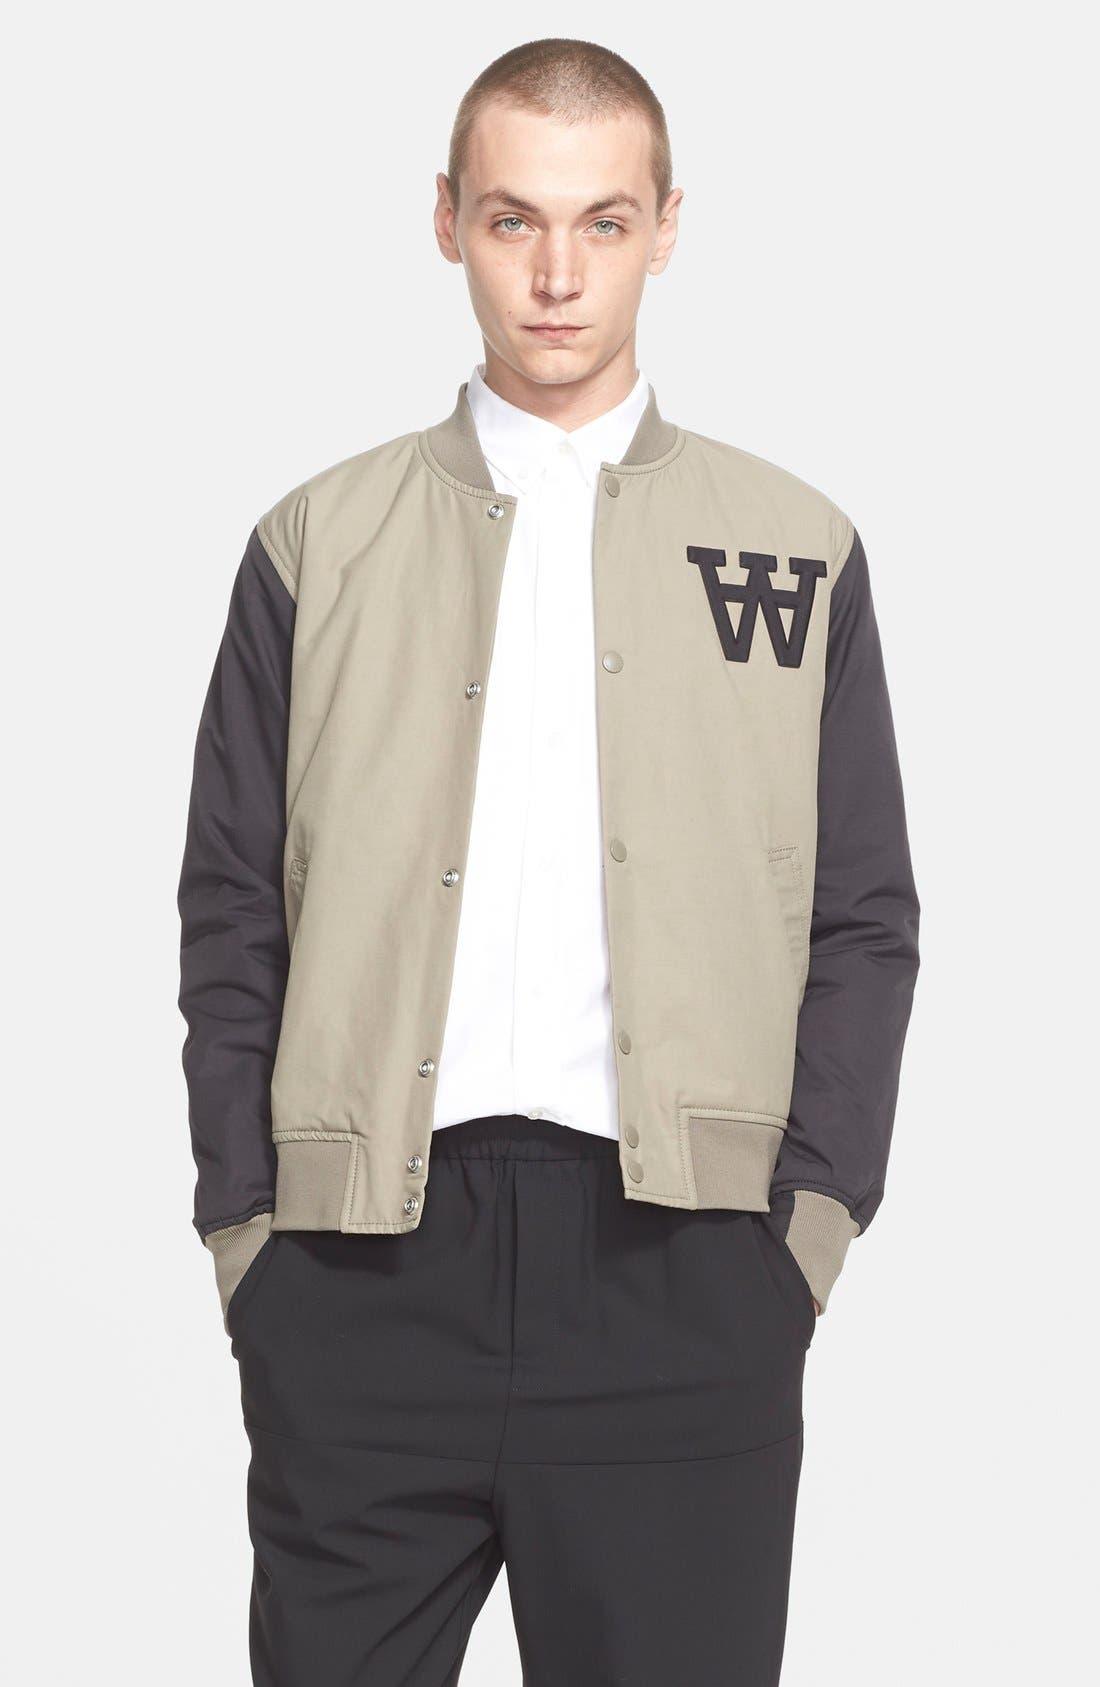 Alternate Image 1 Selected - Wood Wood 'Billie' Varsity Jacket